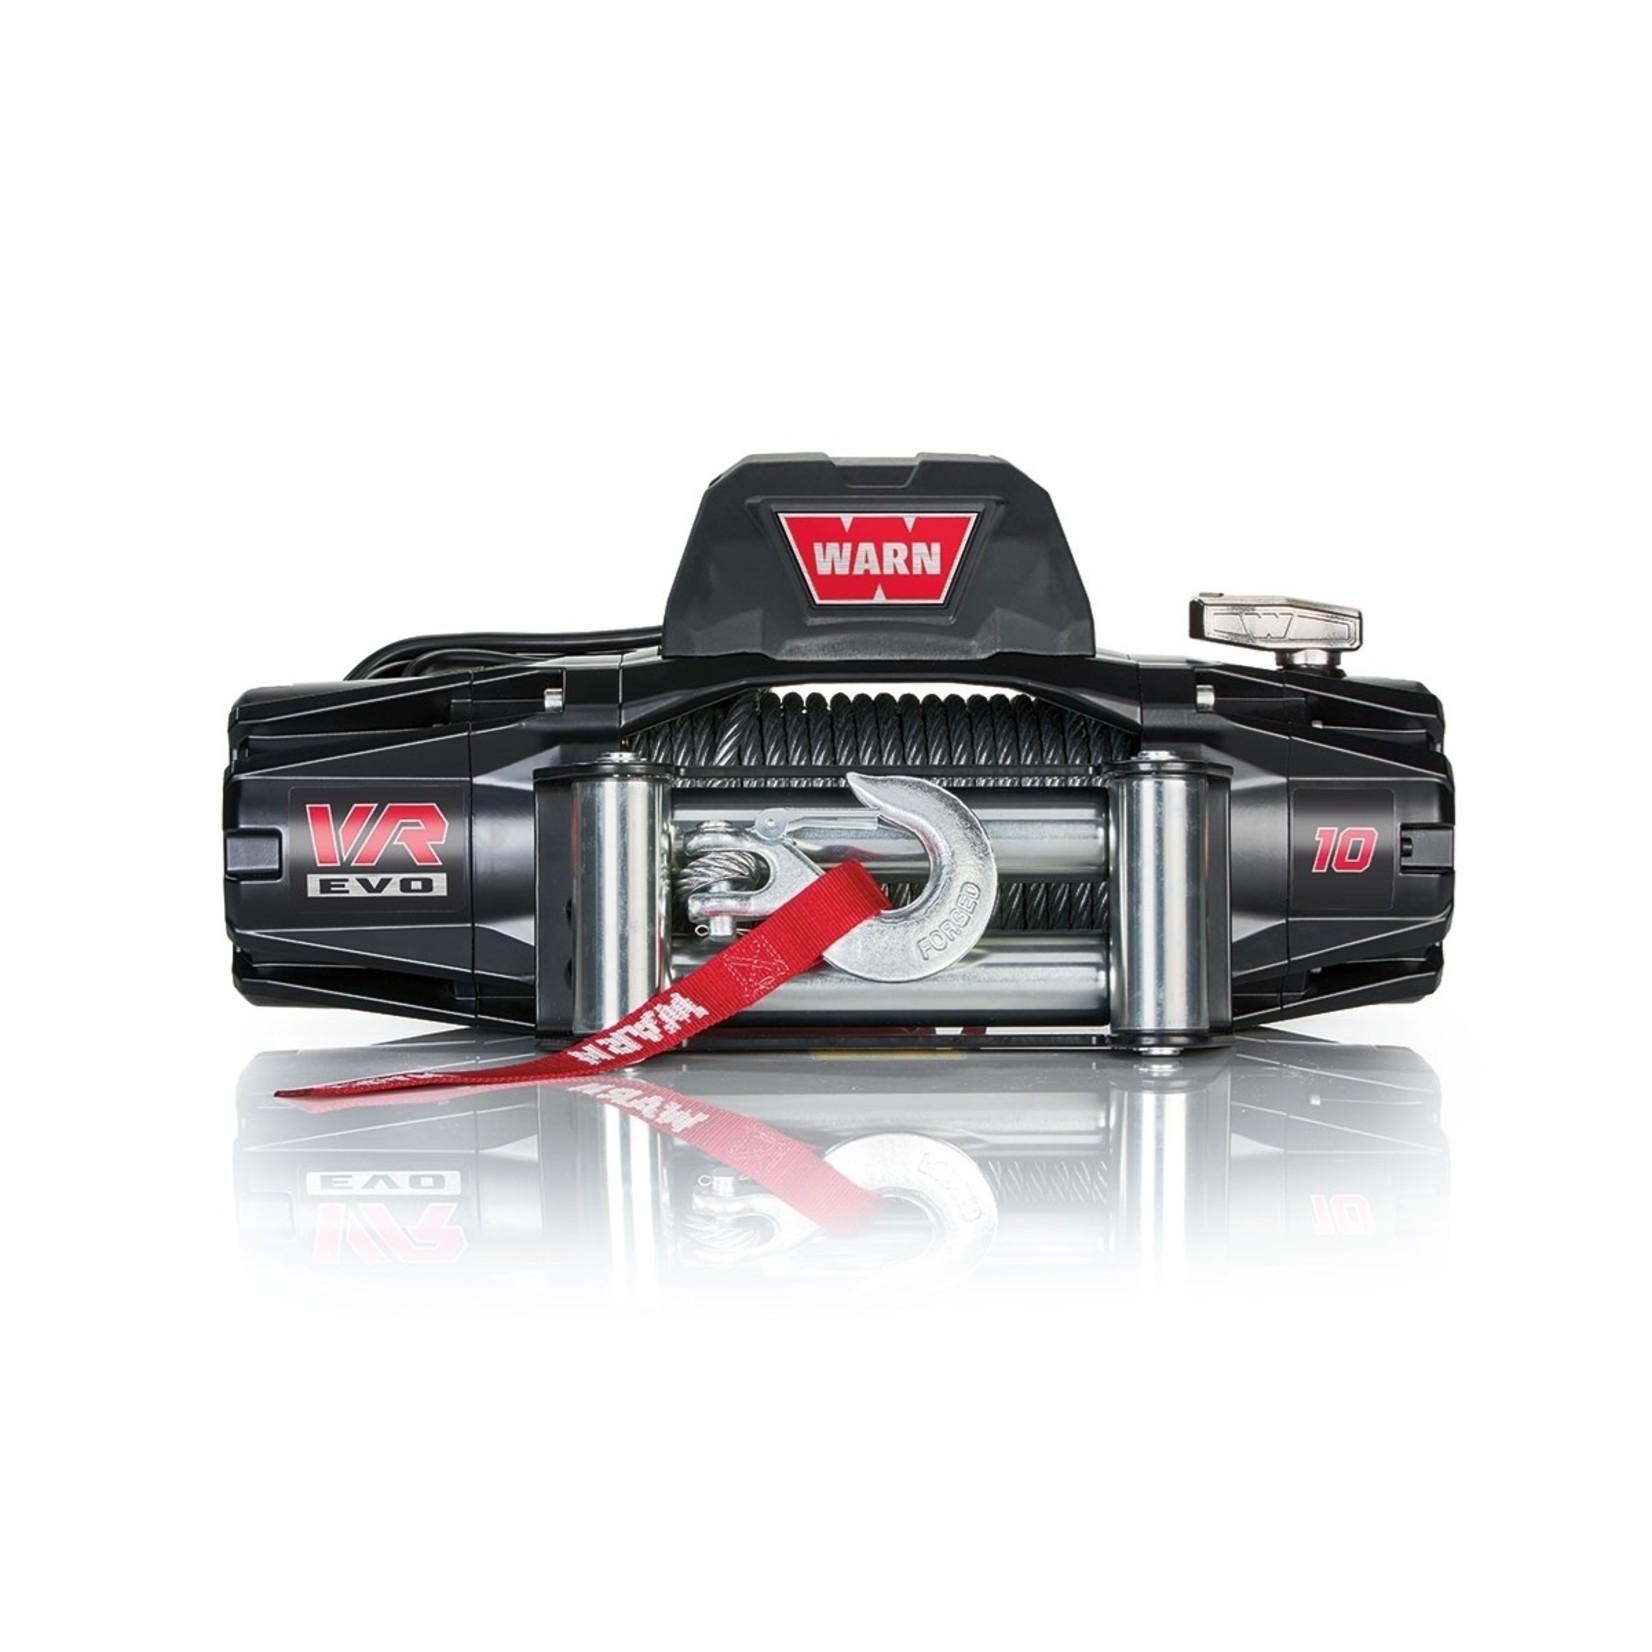 Warn VR EVO 10 Winch w/Steel Cable